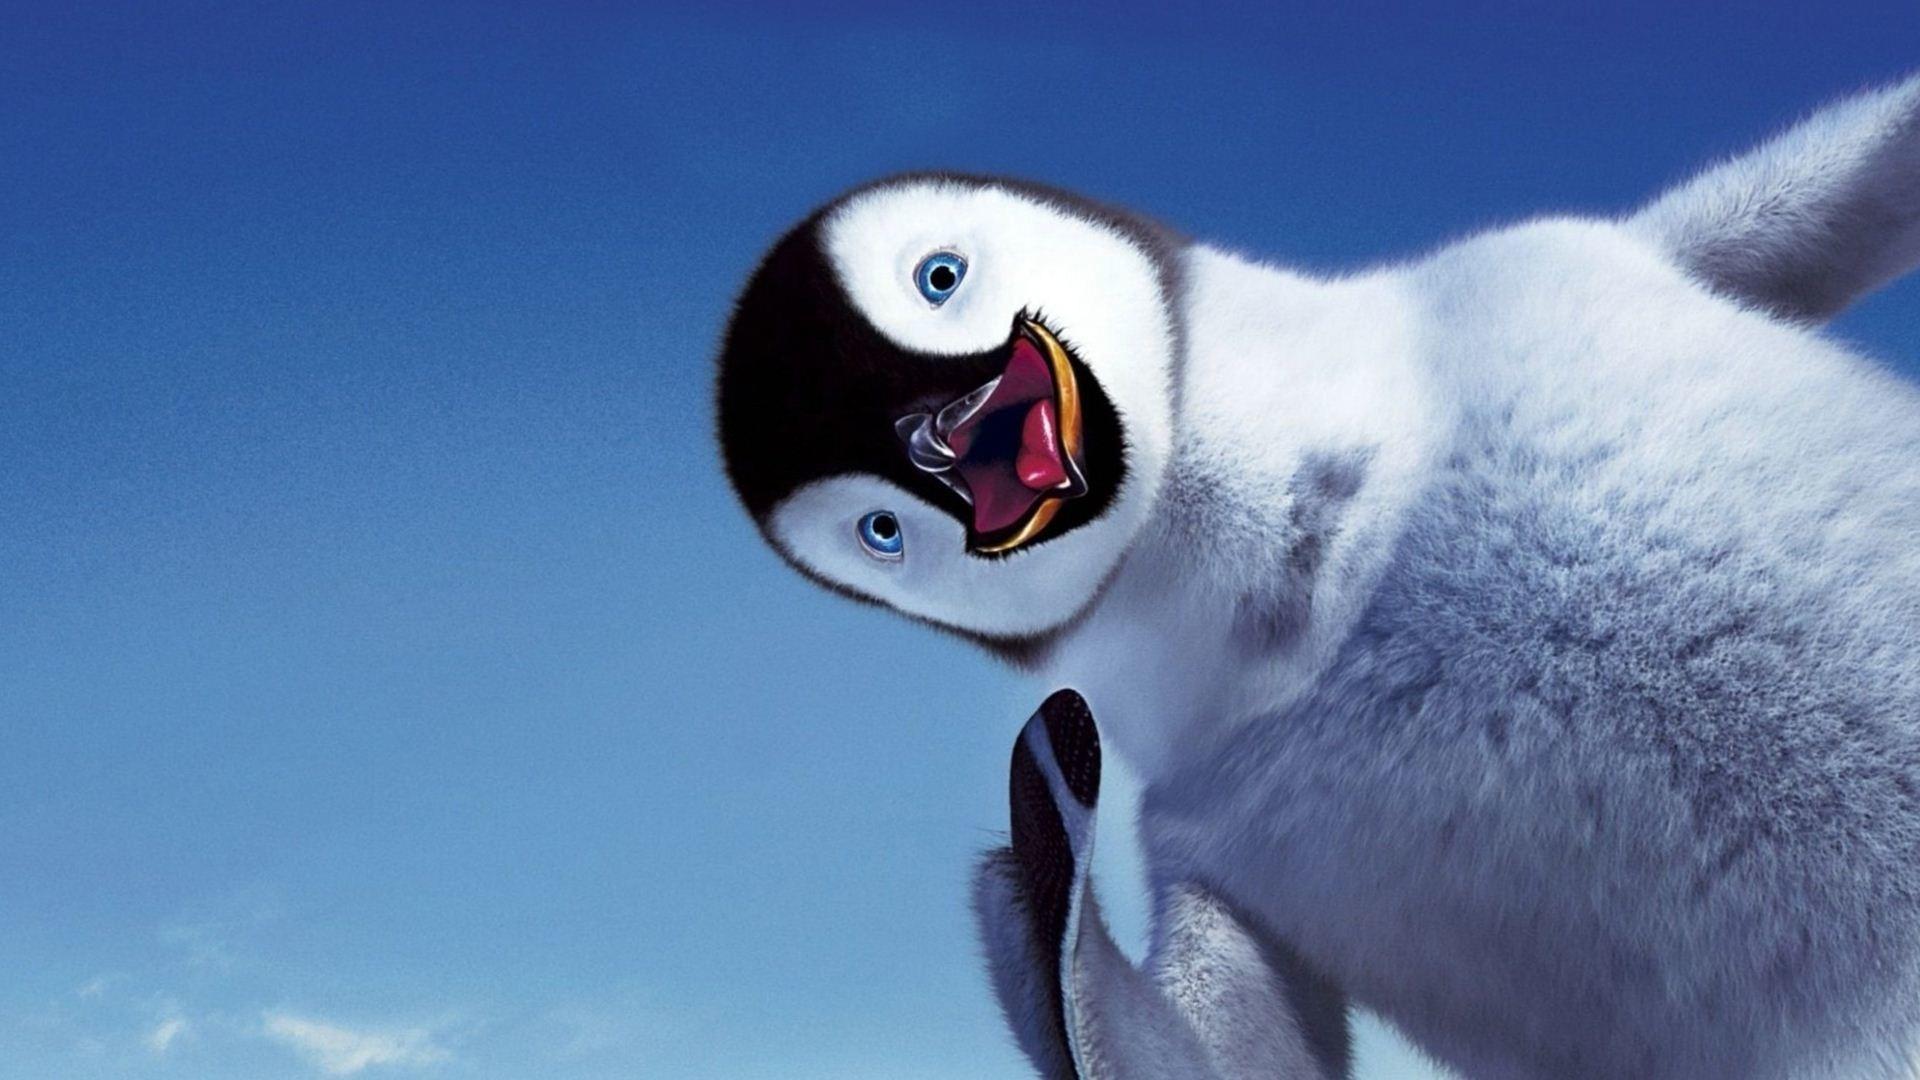 Baby Penguin Wallpaper Phone : Animals Wallpaper – Timmatic.com